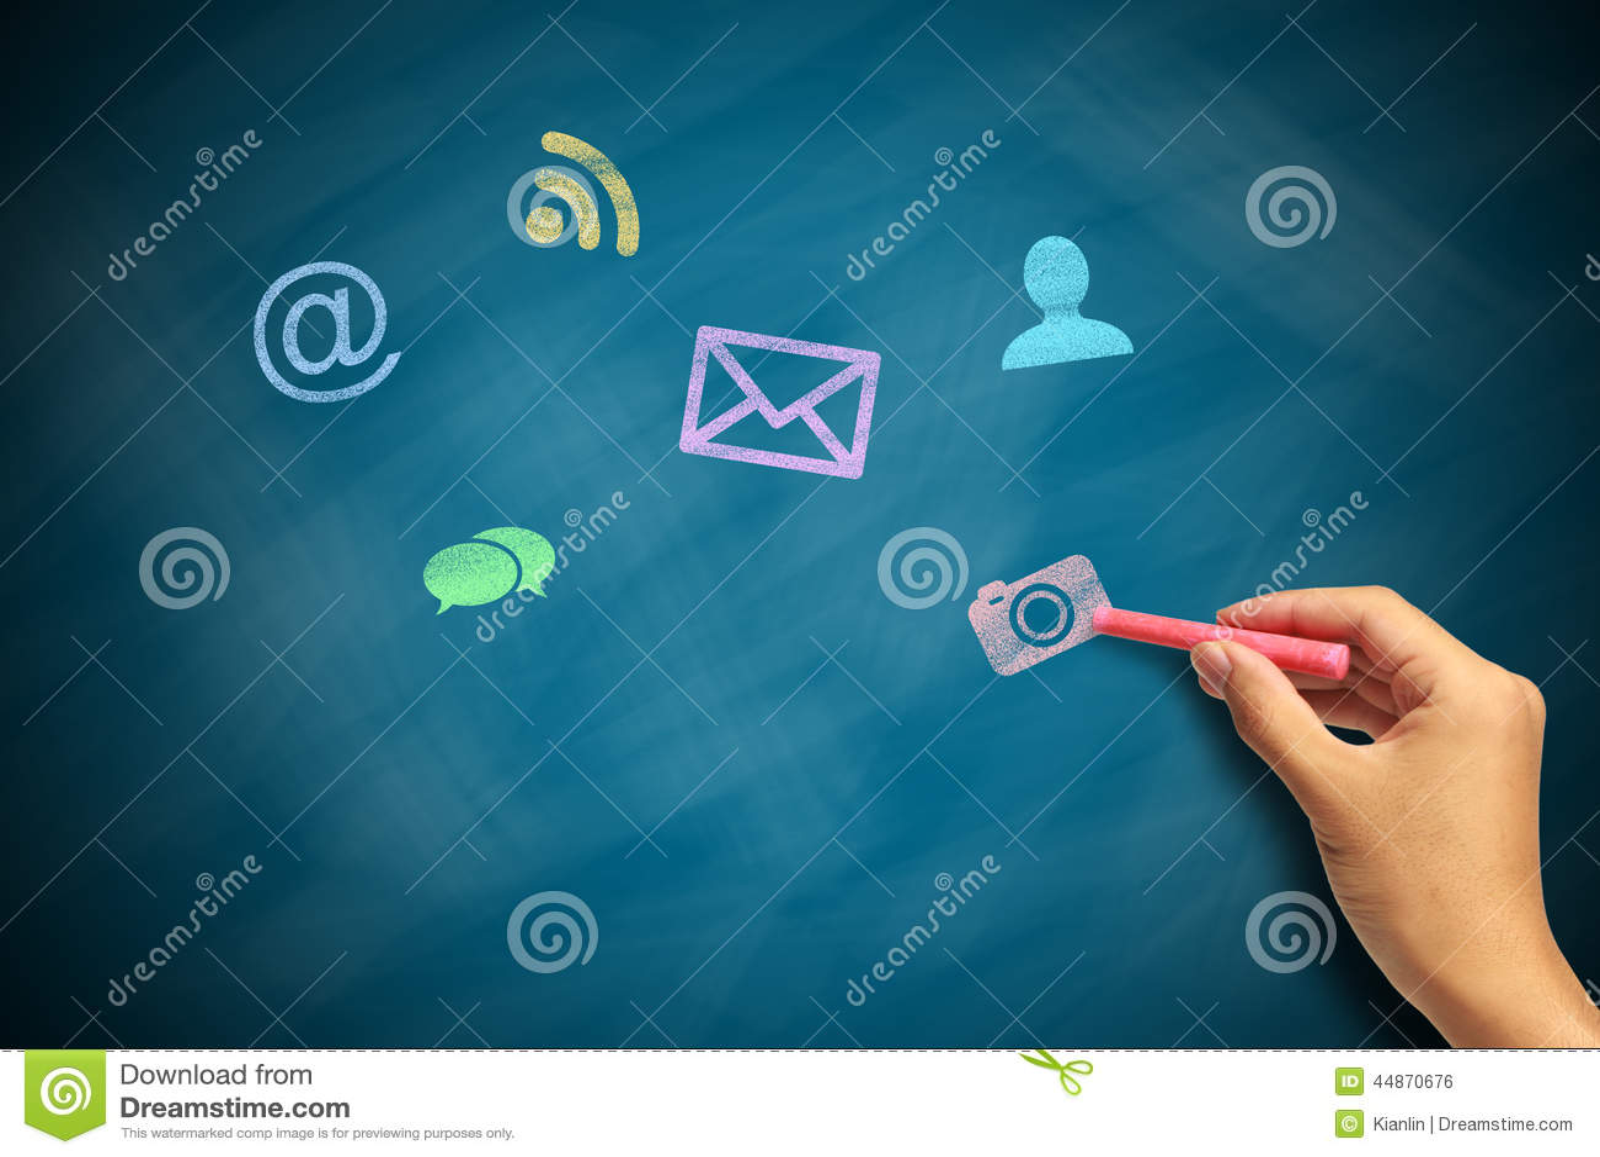 Social Media Concept 3